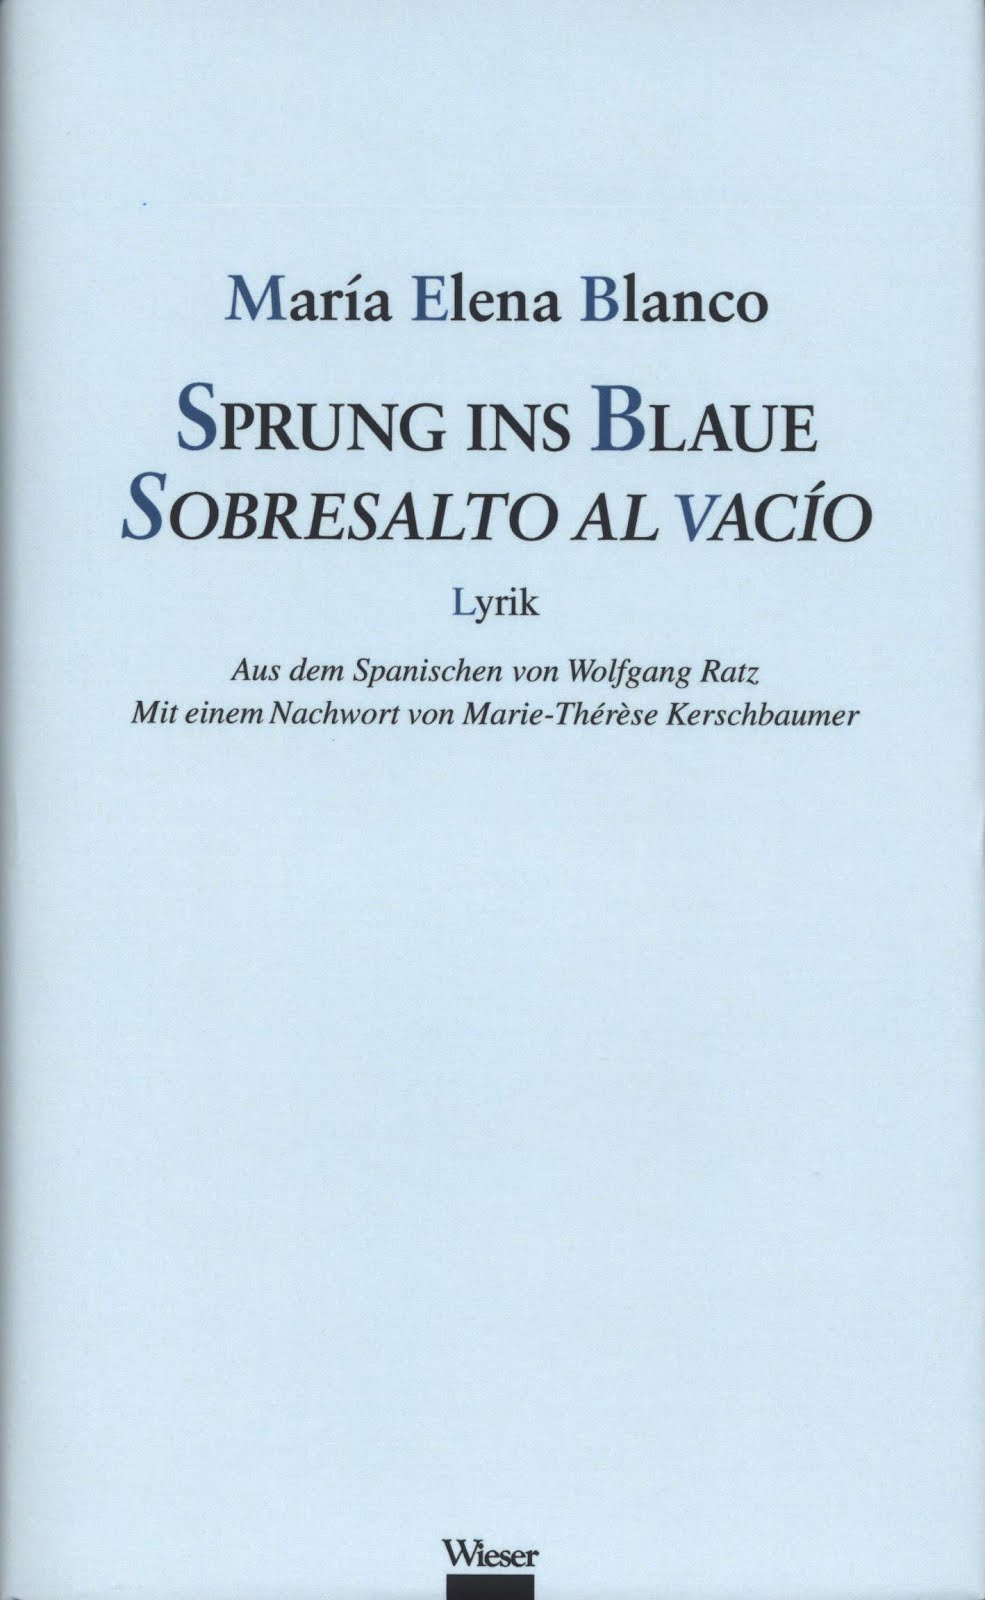 Sprung ins Blaue/Sobresalto al vacío (Wieser Verlag, Klagenfurt, Austria, 2015)